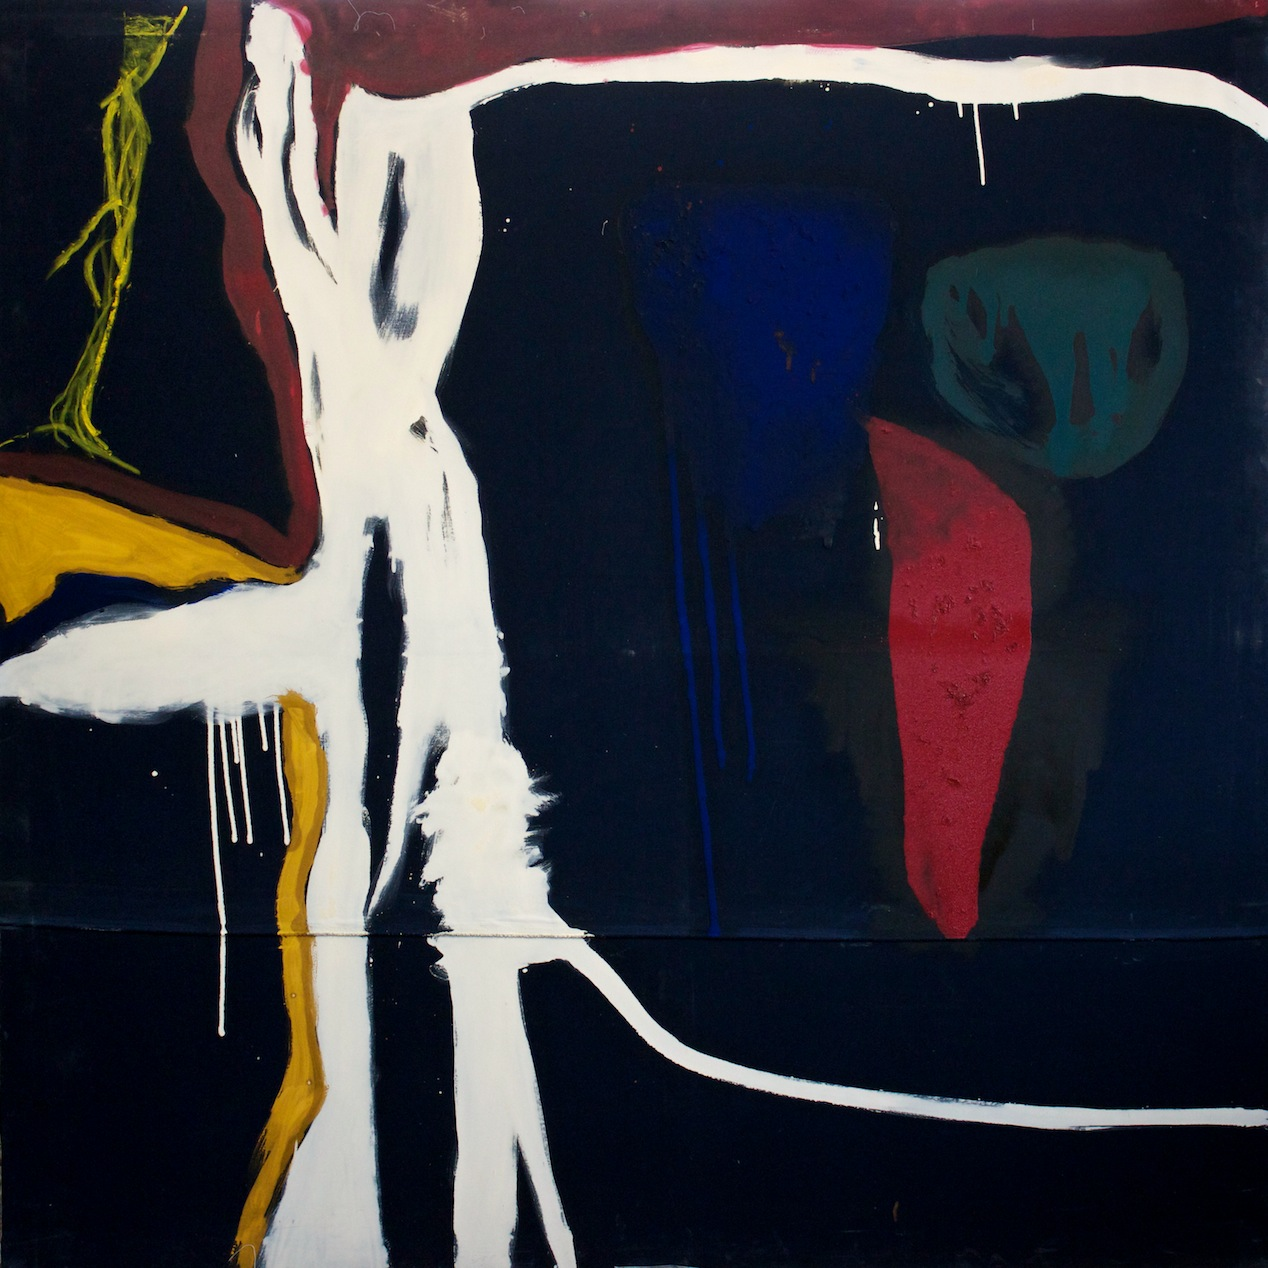 Marcello Mariani - Forma Archetipa - Oil and mixed media on canvas - 2012